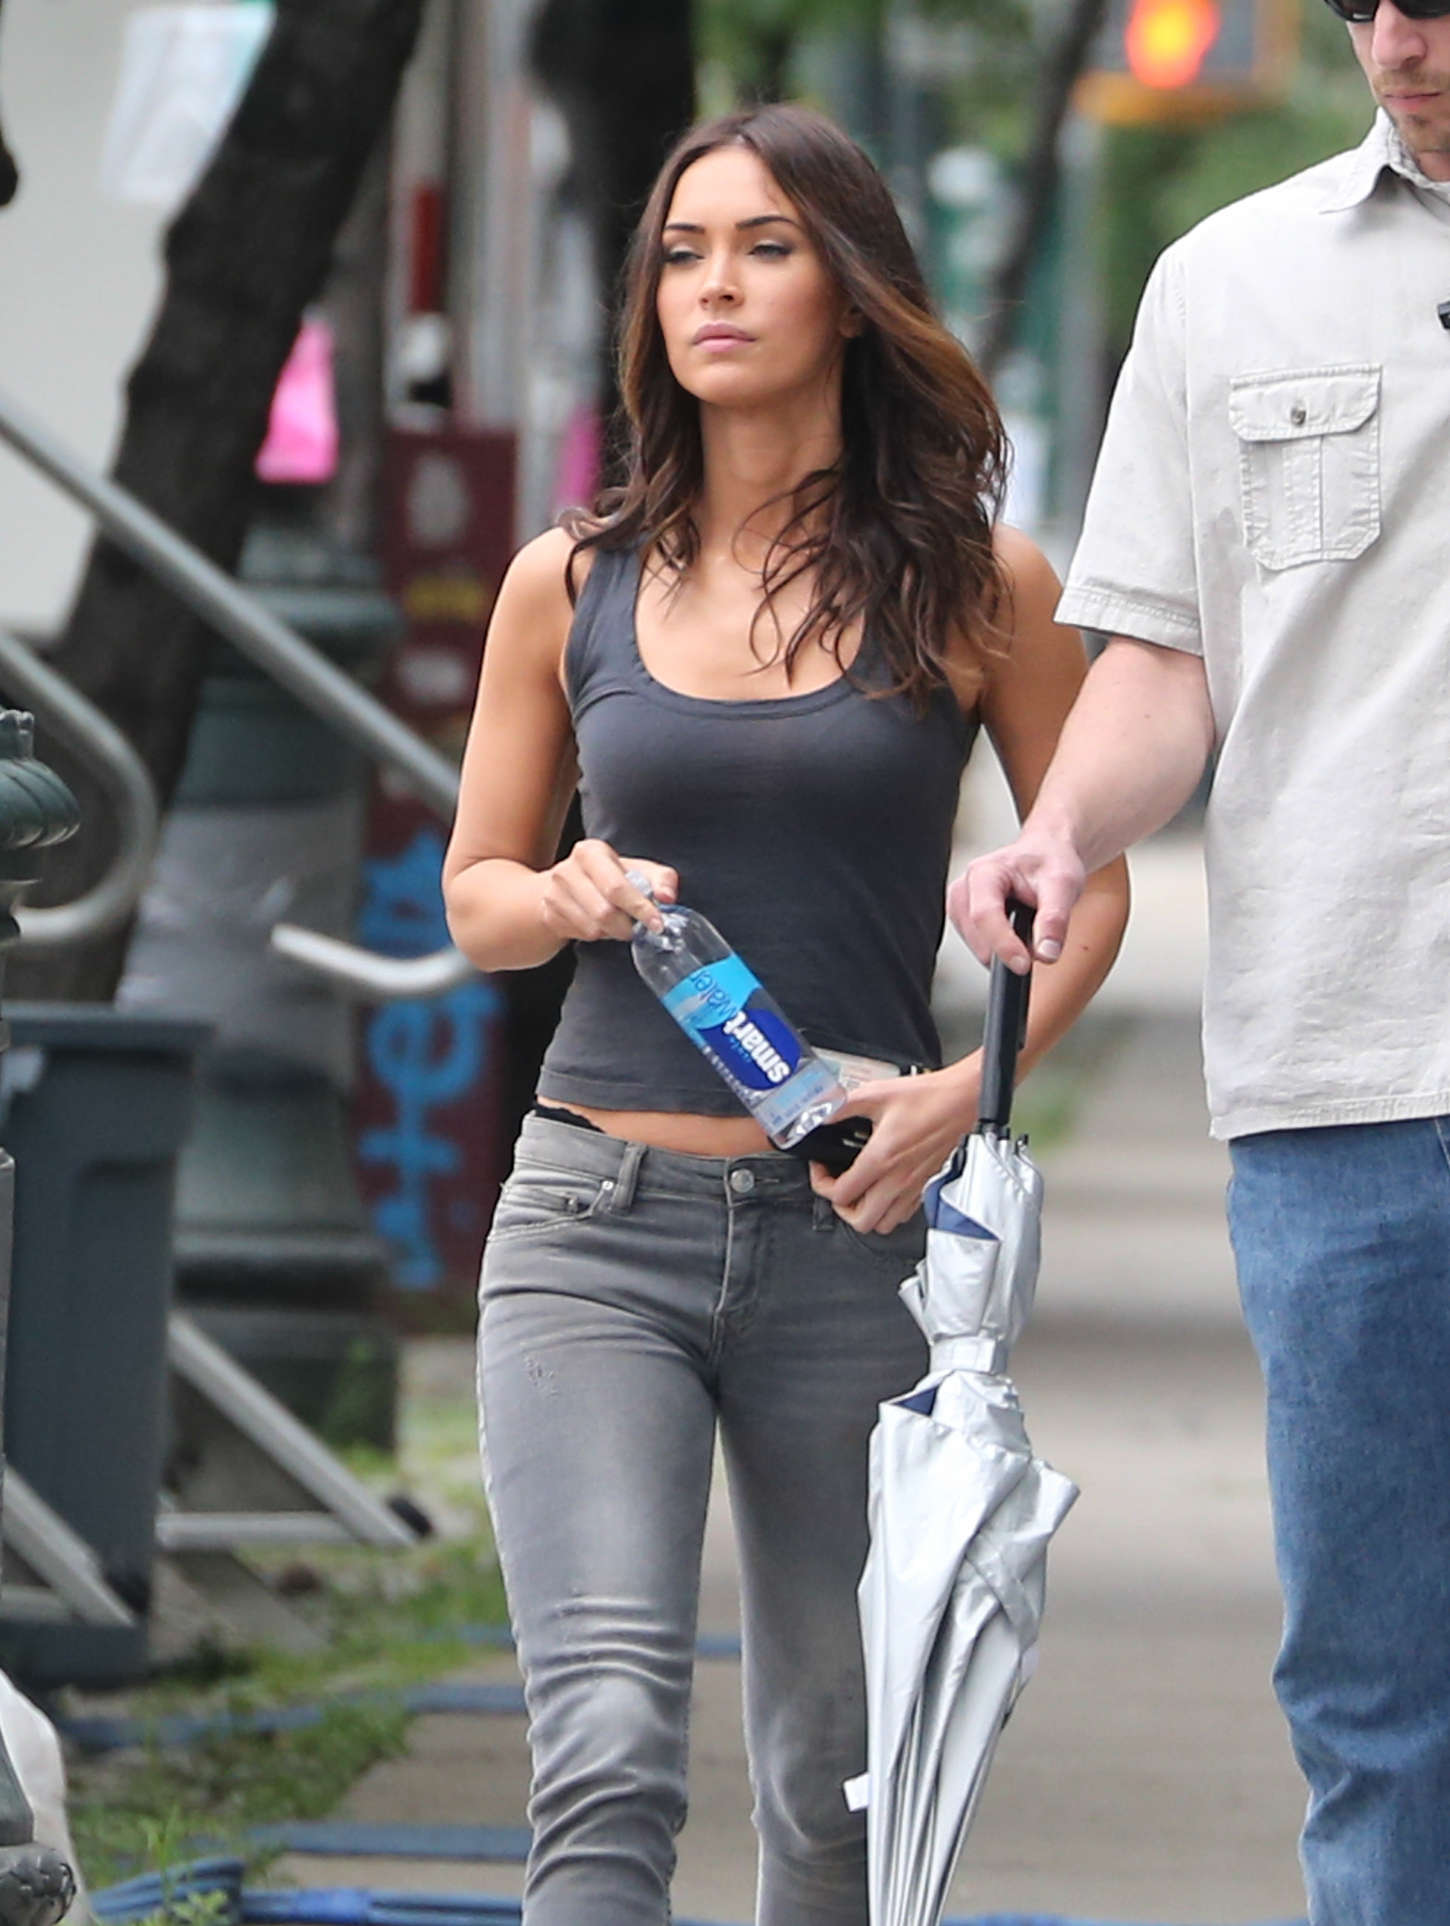 Megan Fox Booty In Jeans On Teenage Mutant Ninja Turtles 2 03